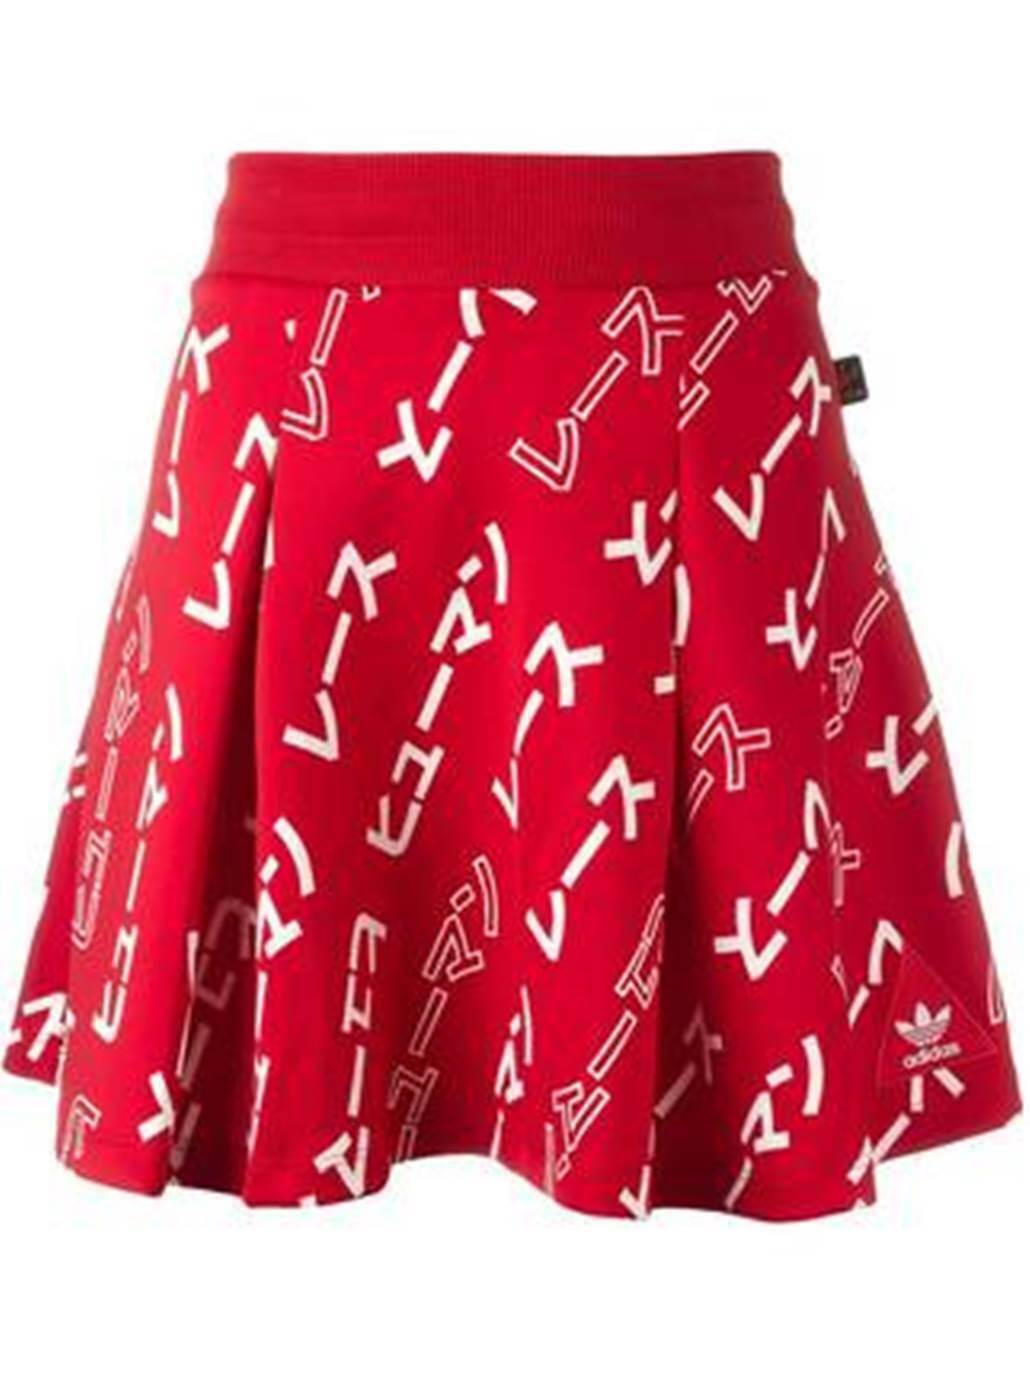 NWT Adidas Pharrell Williams Human Race NMD Red Womens Skirt BR1860 Powered